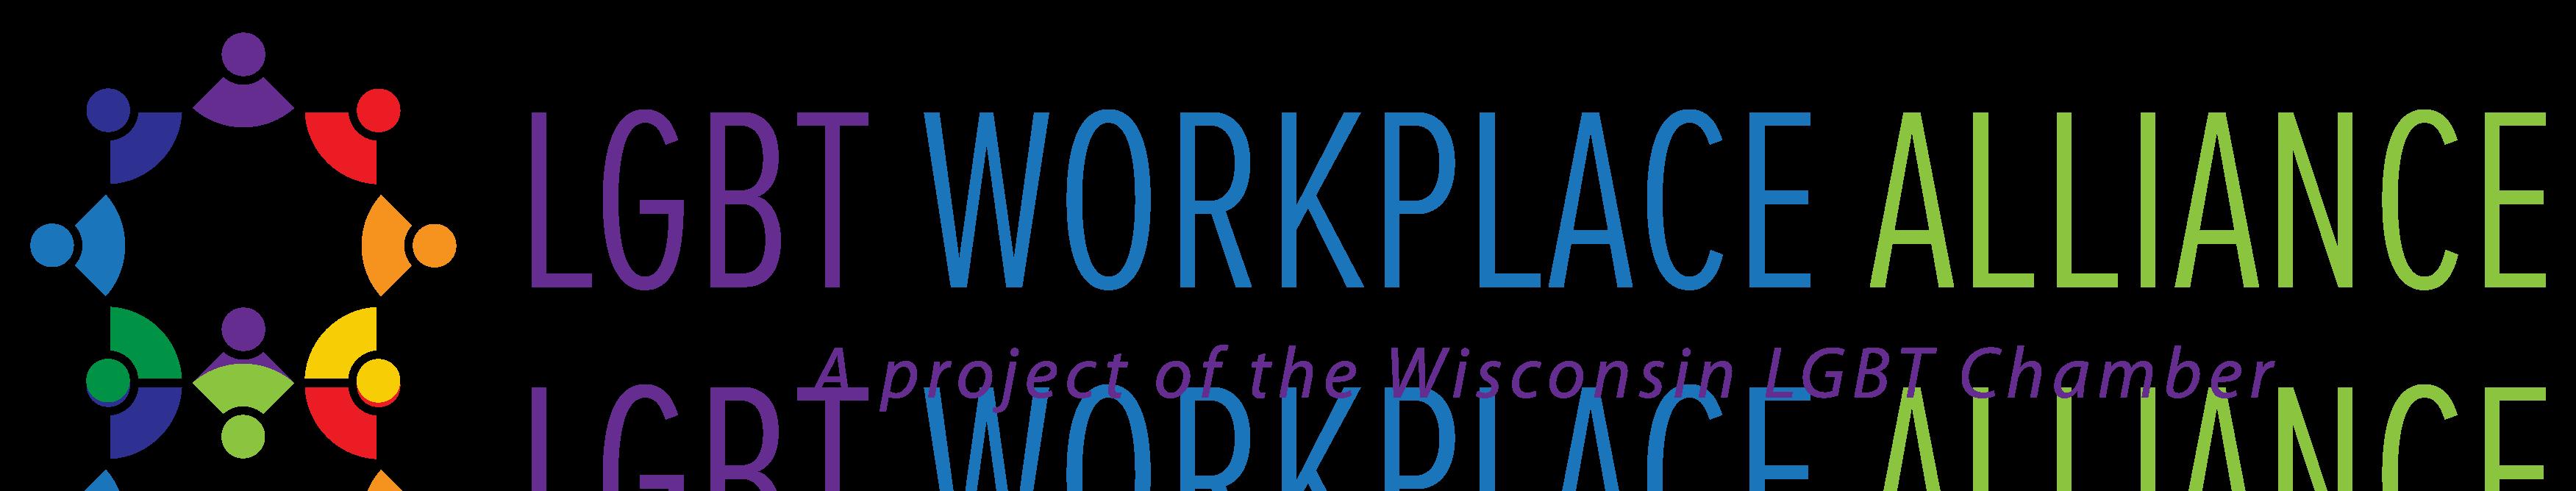 LGBT Workplace Alliance